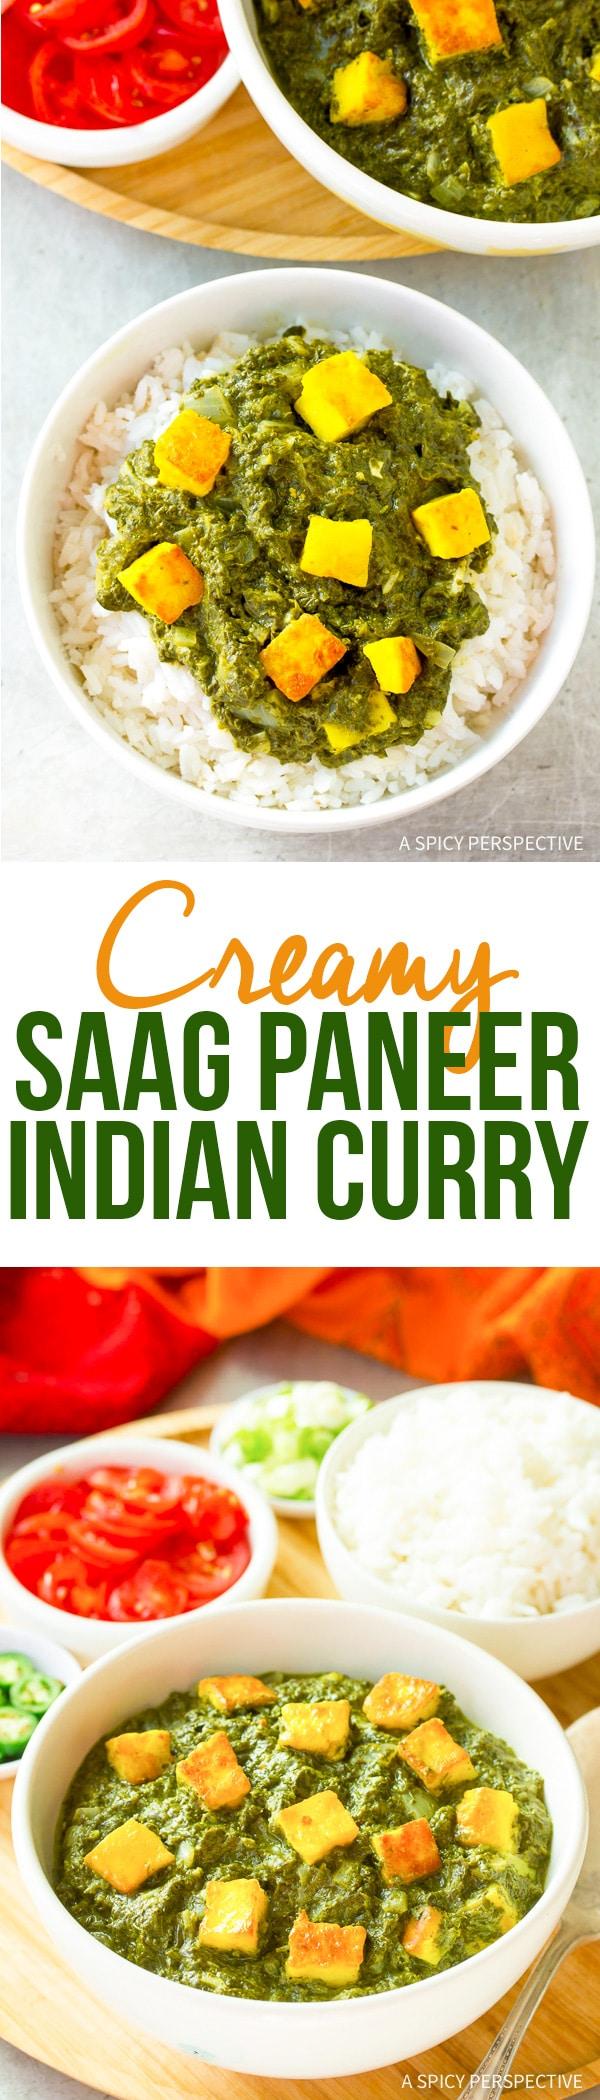 Silky Creamy Saag Paneer Recipe